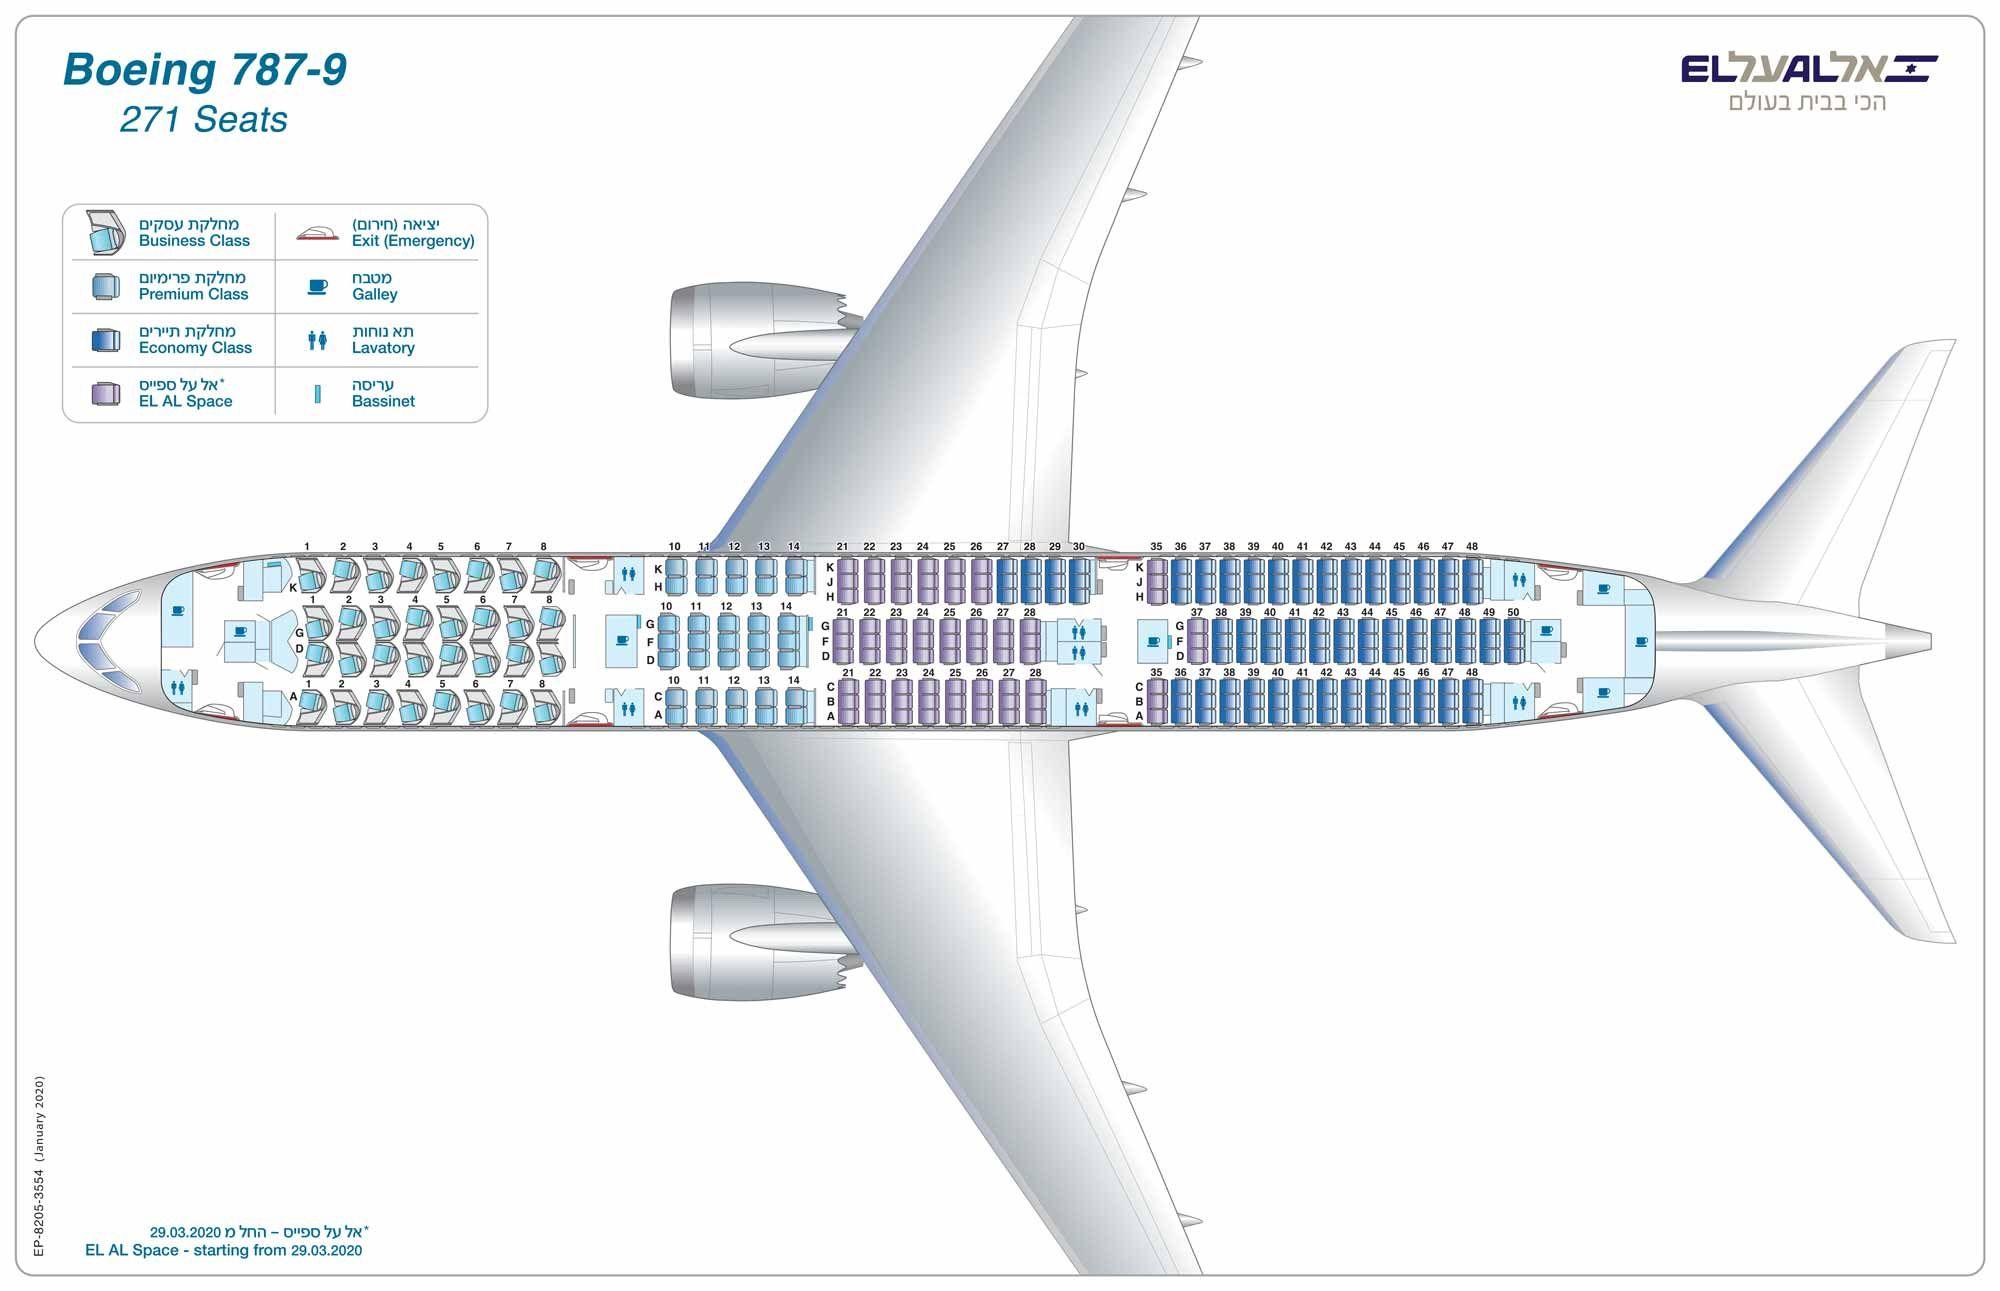 El Al Aircraft 789 Aircraft Aircraft Modeling Boeing 787 9 Dreamliner